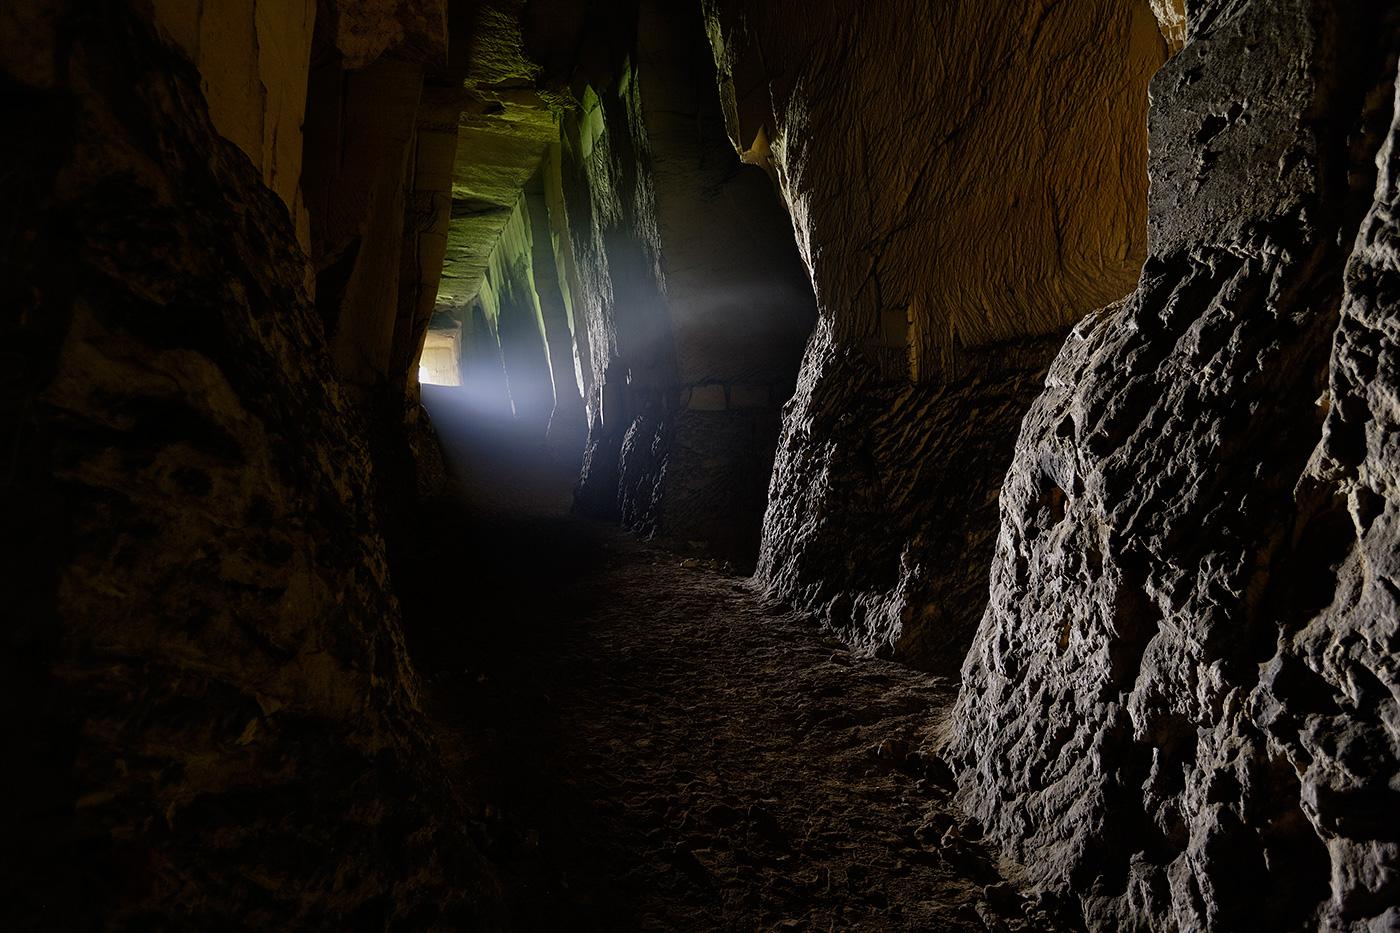 Mergelgruben - Mergelgrotten - Dungeon